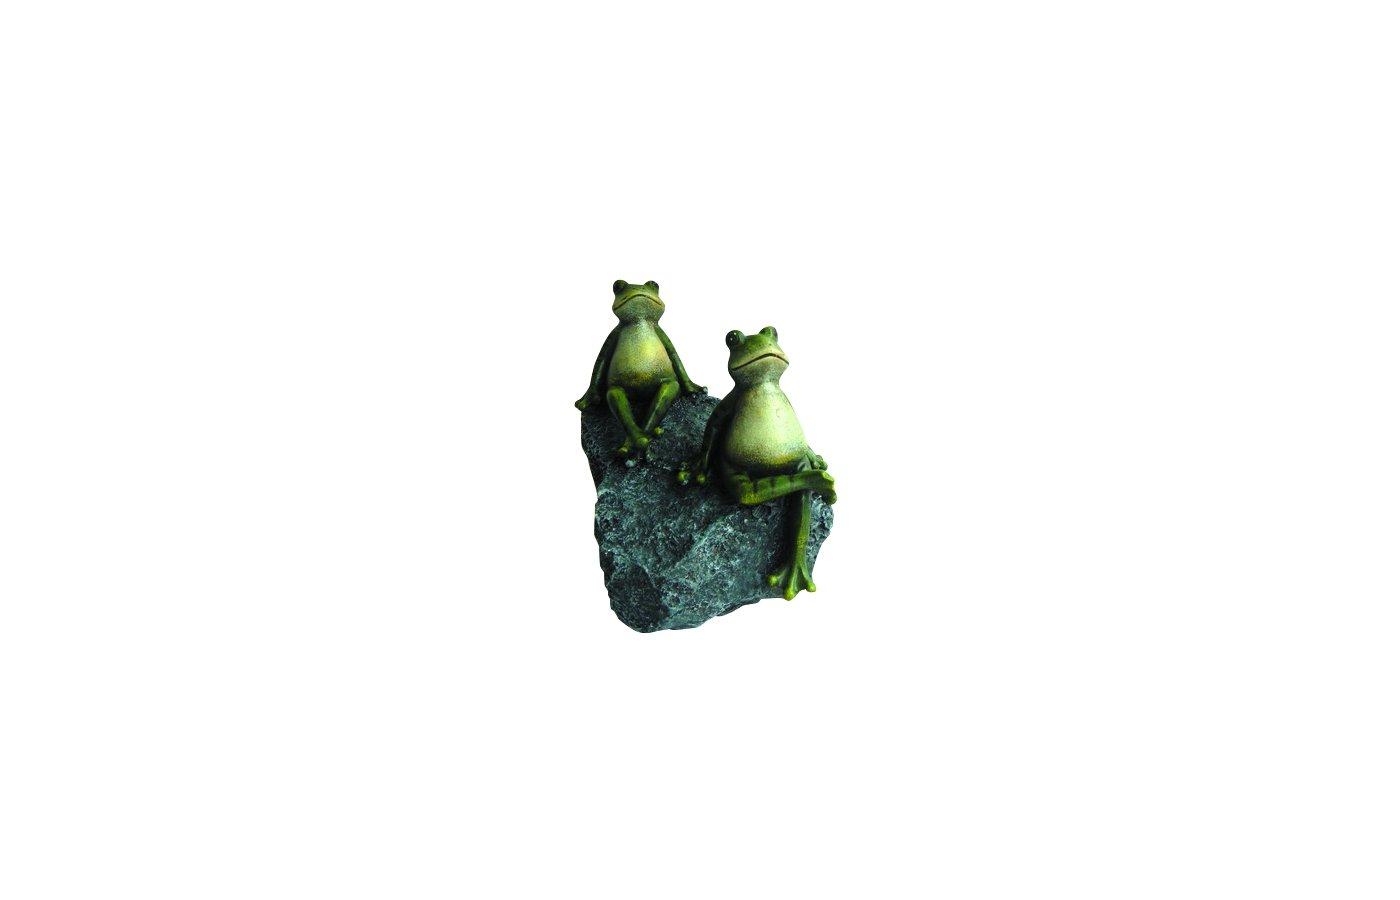 Инвентарь GREEN APPLE GA200-16 Фигурка садовая Лягушки 14*10*12.5см